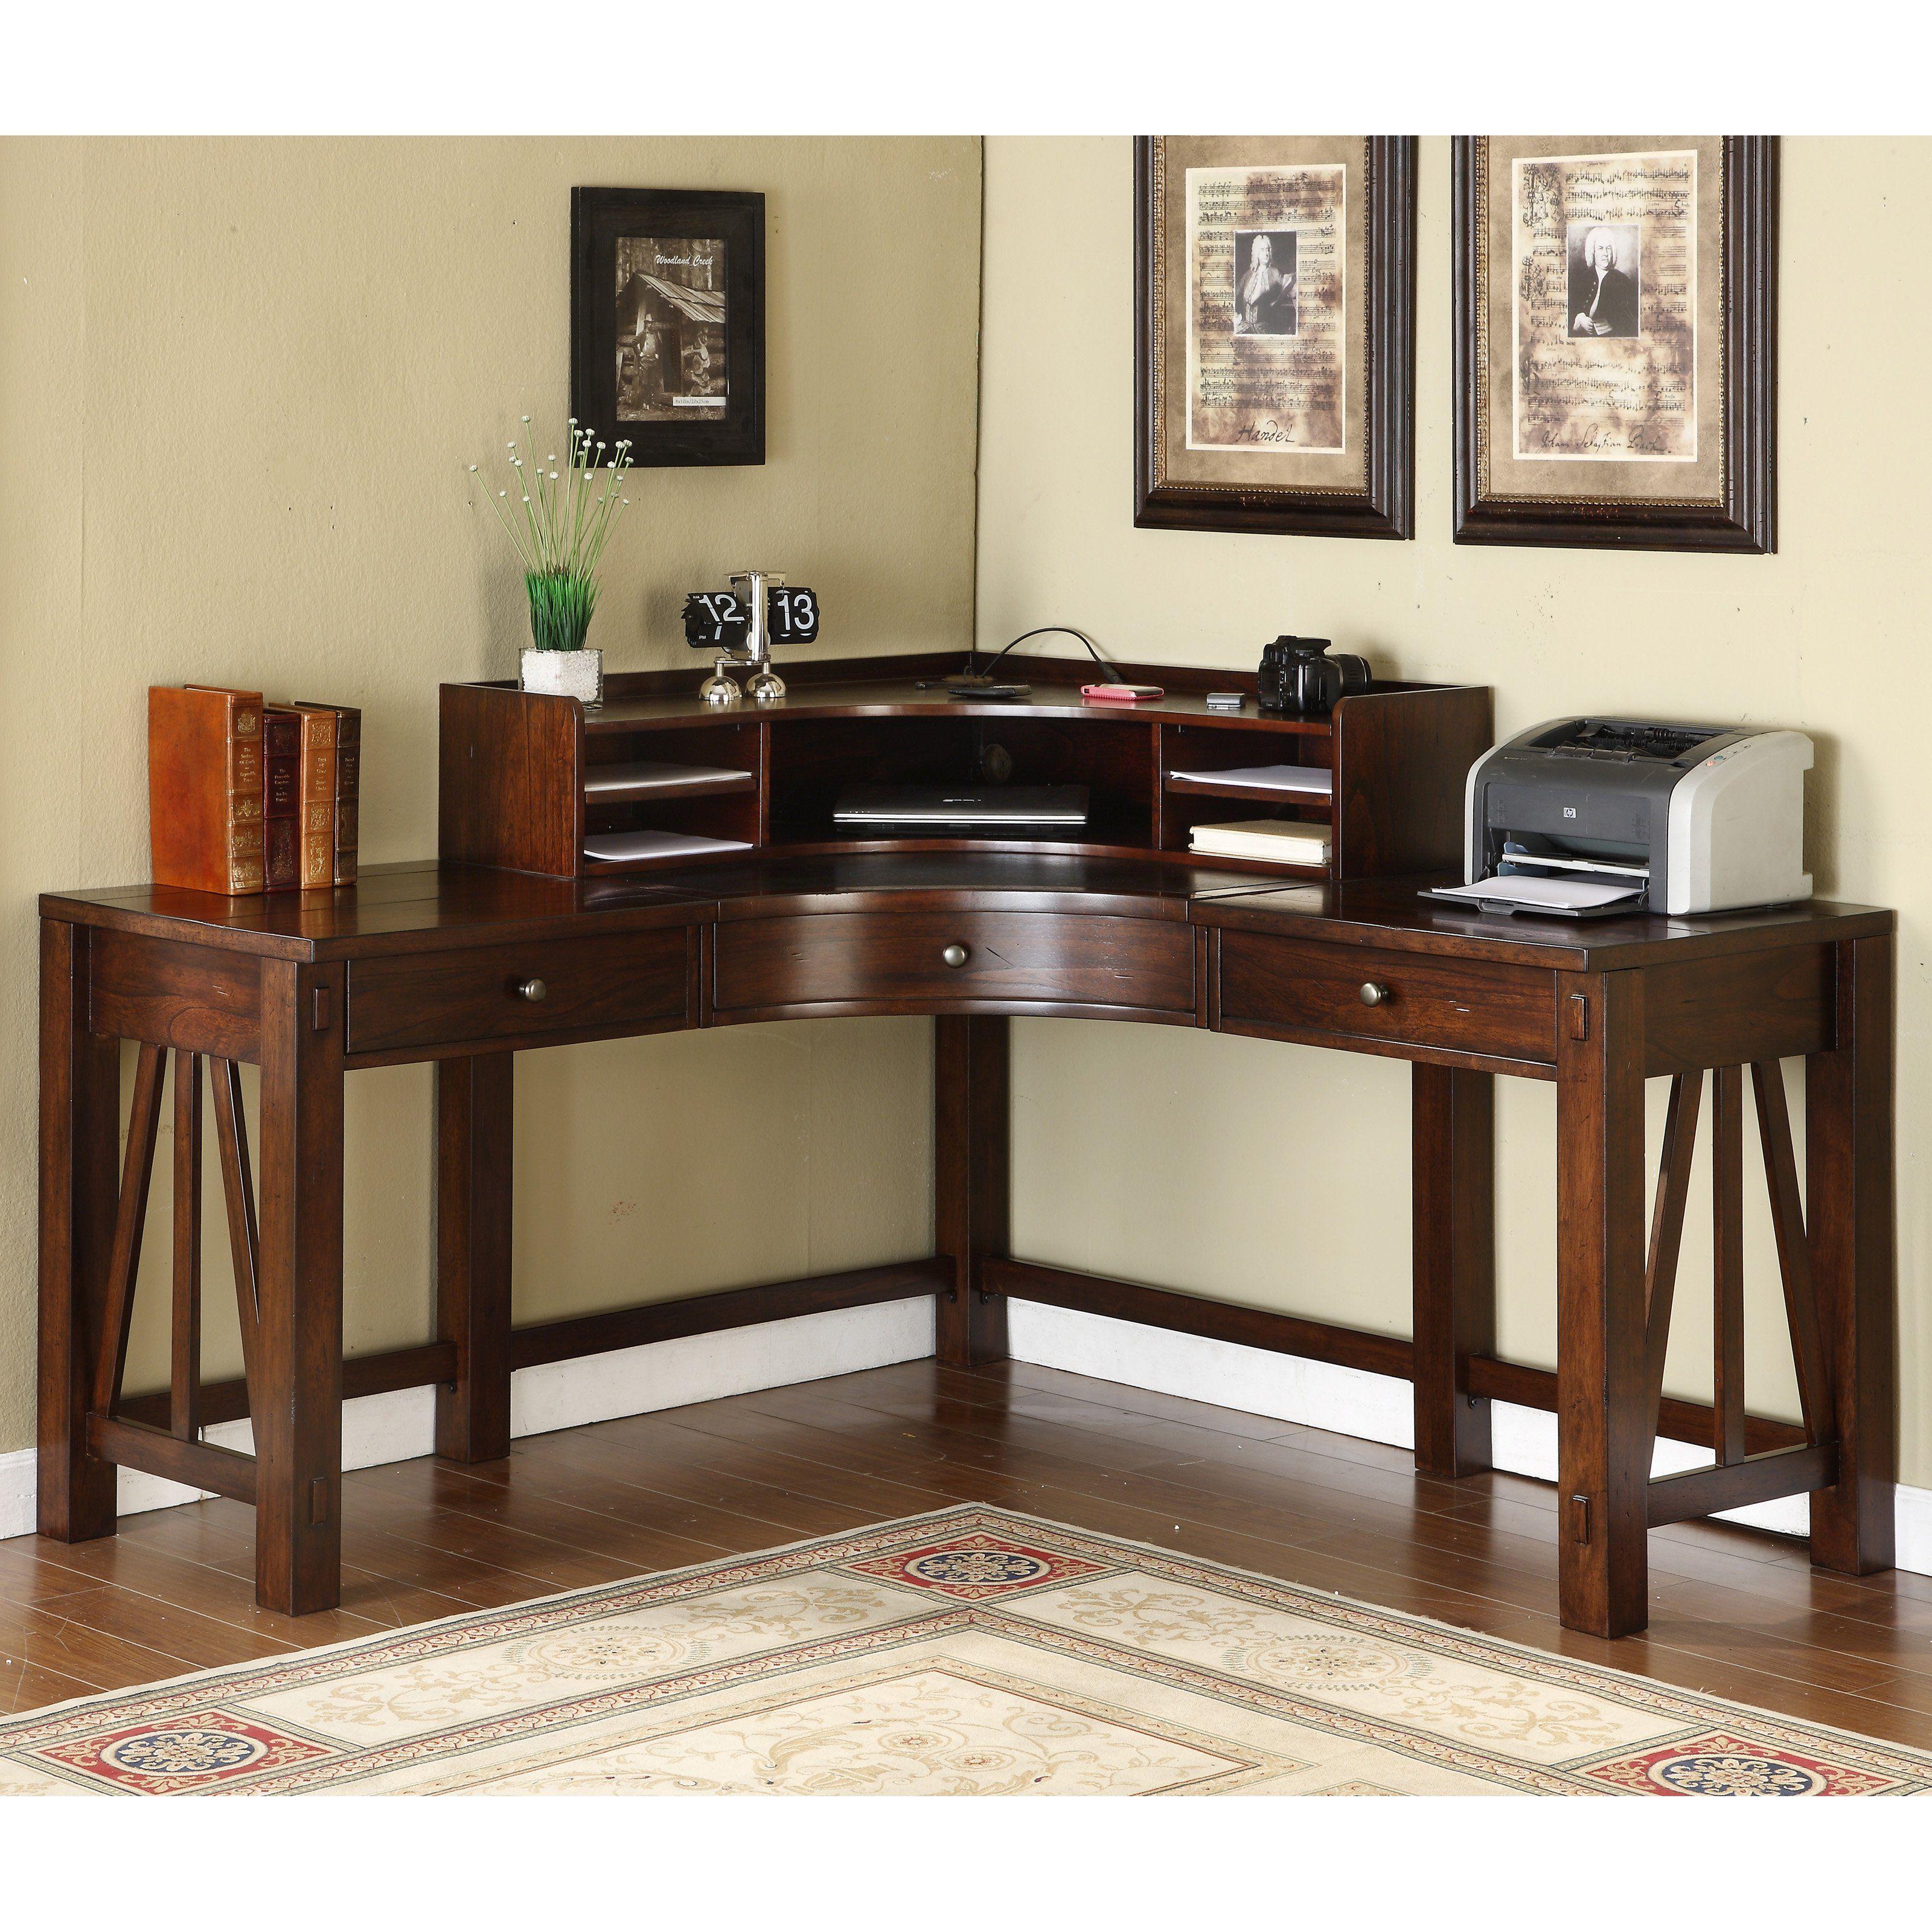 Corner Desk Dark Wood Living Room Sets Furniture Check More At Http Www Intown